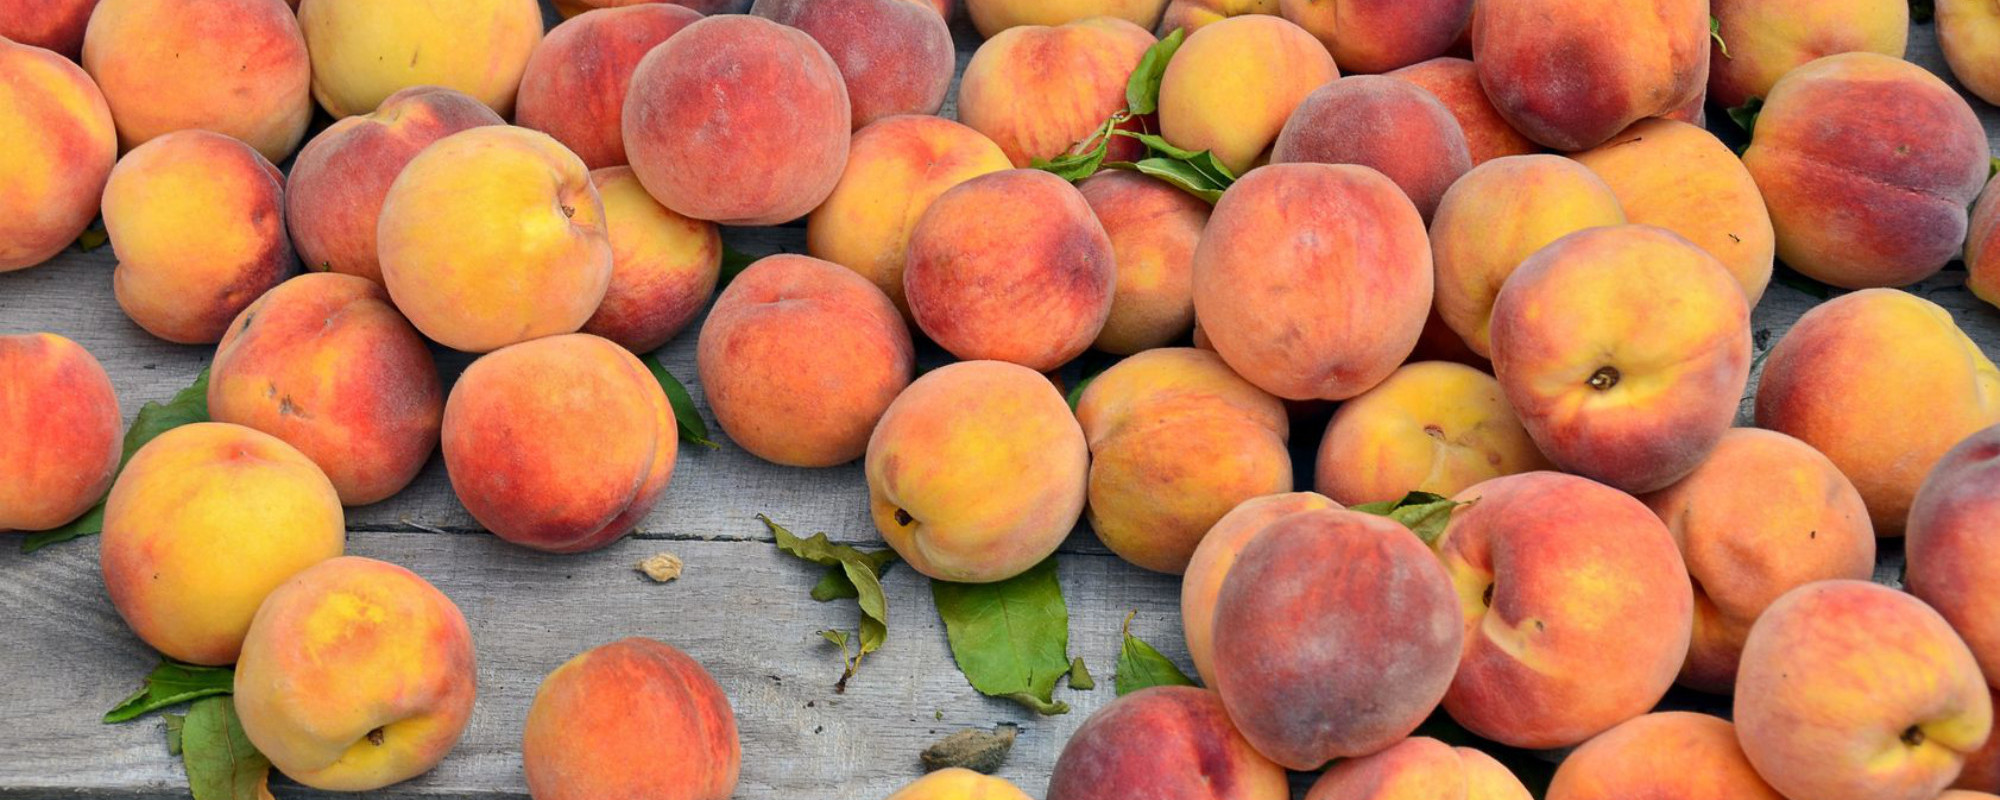 Ungers Market - Peaches